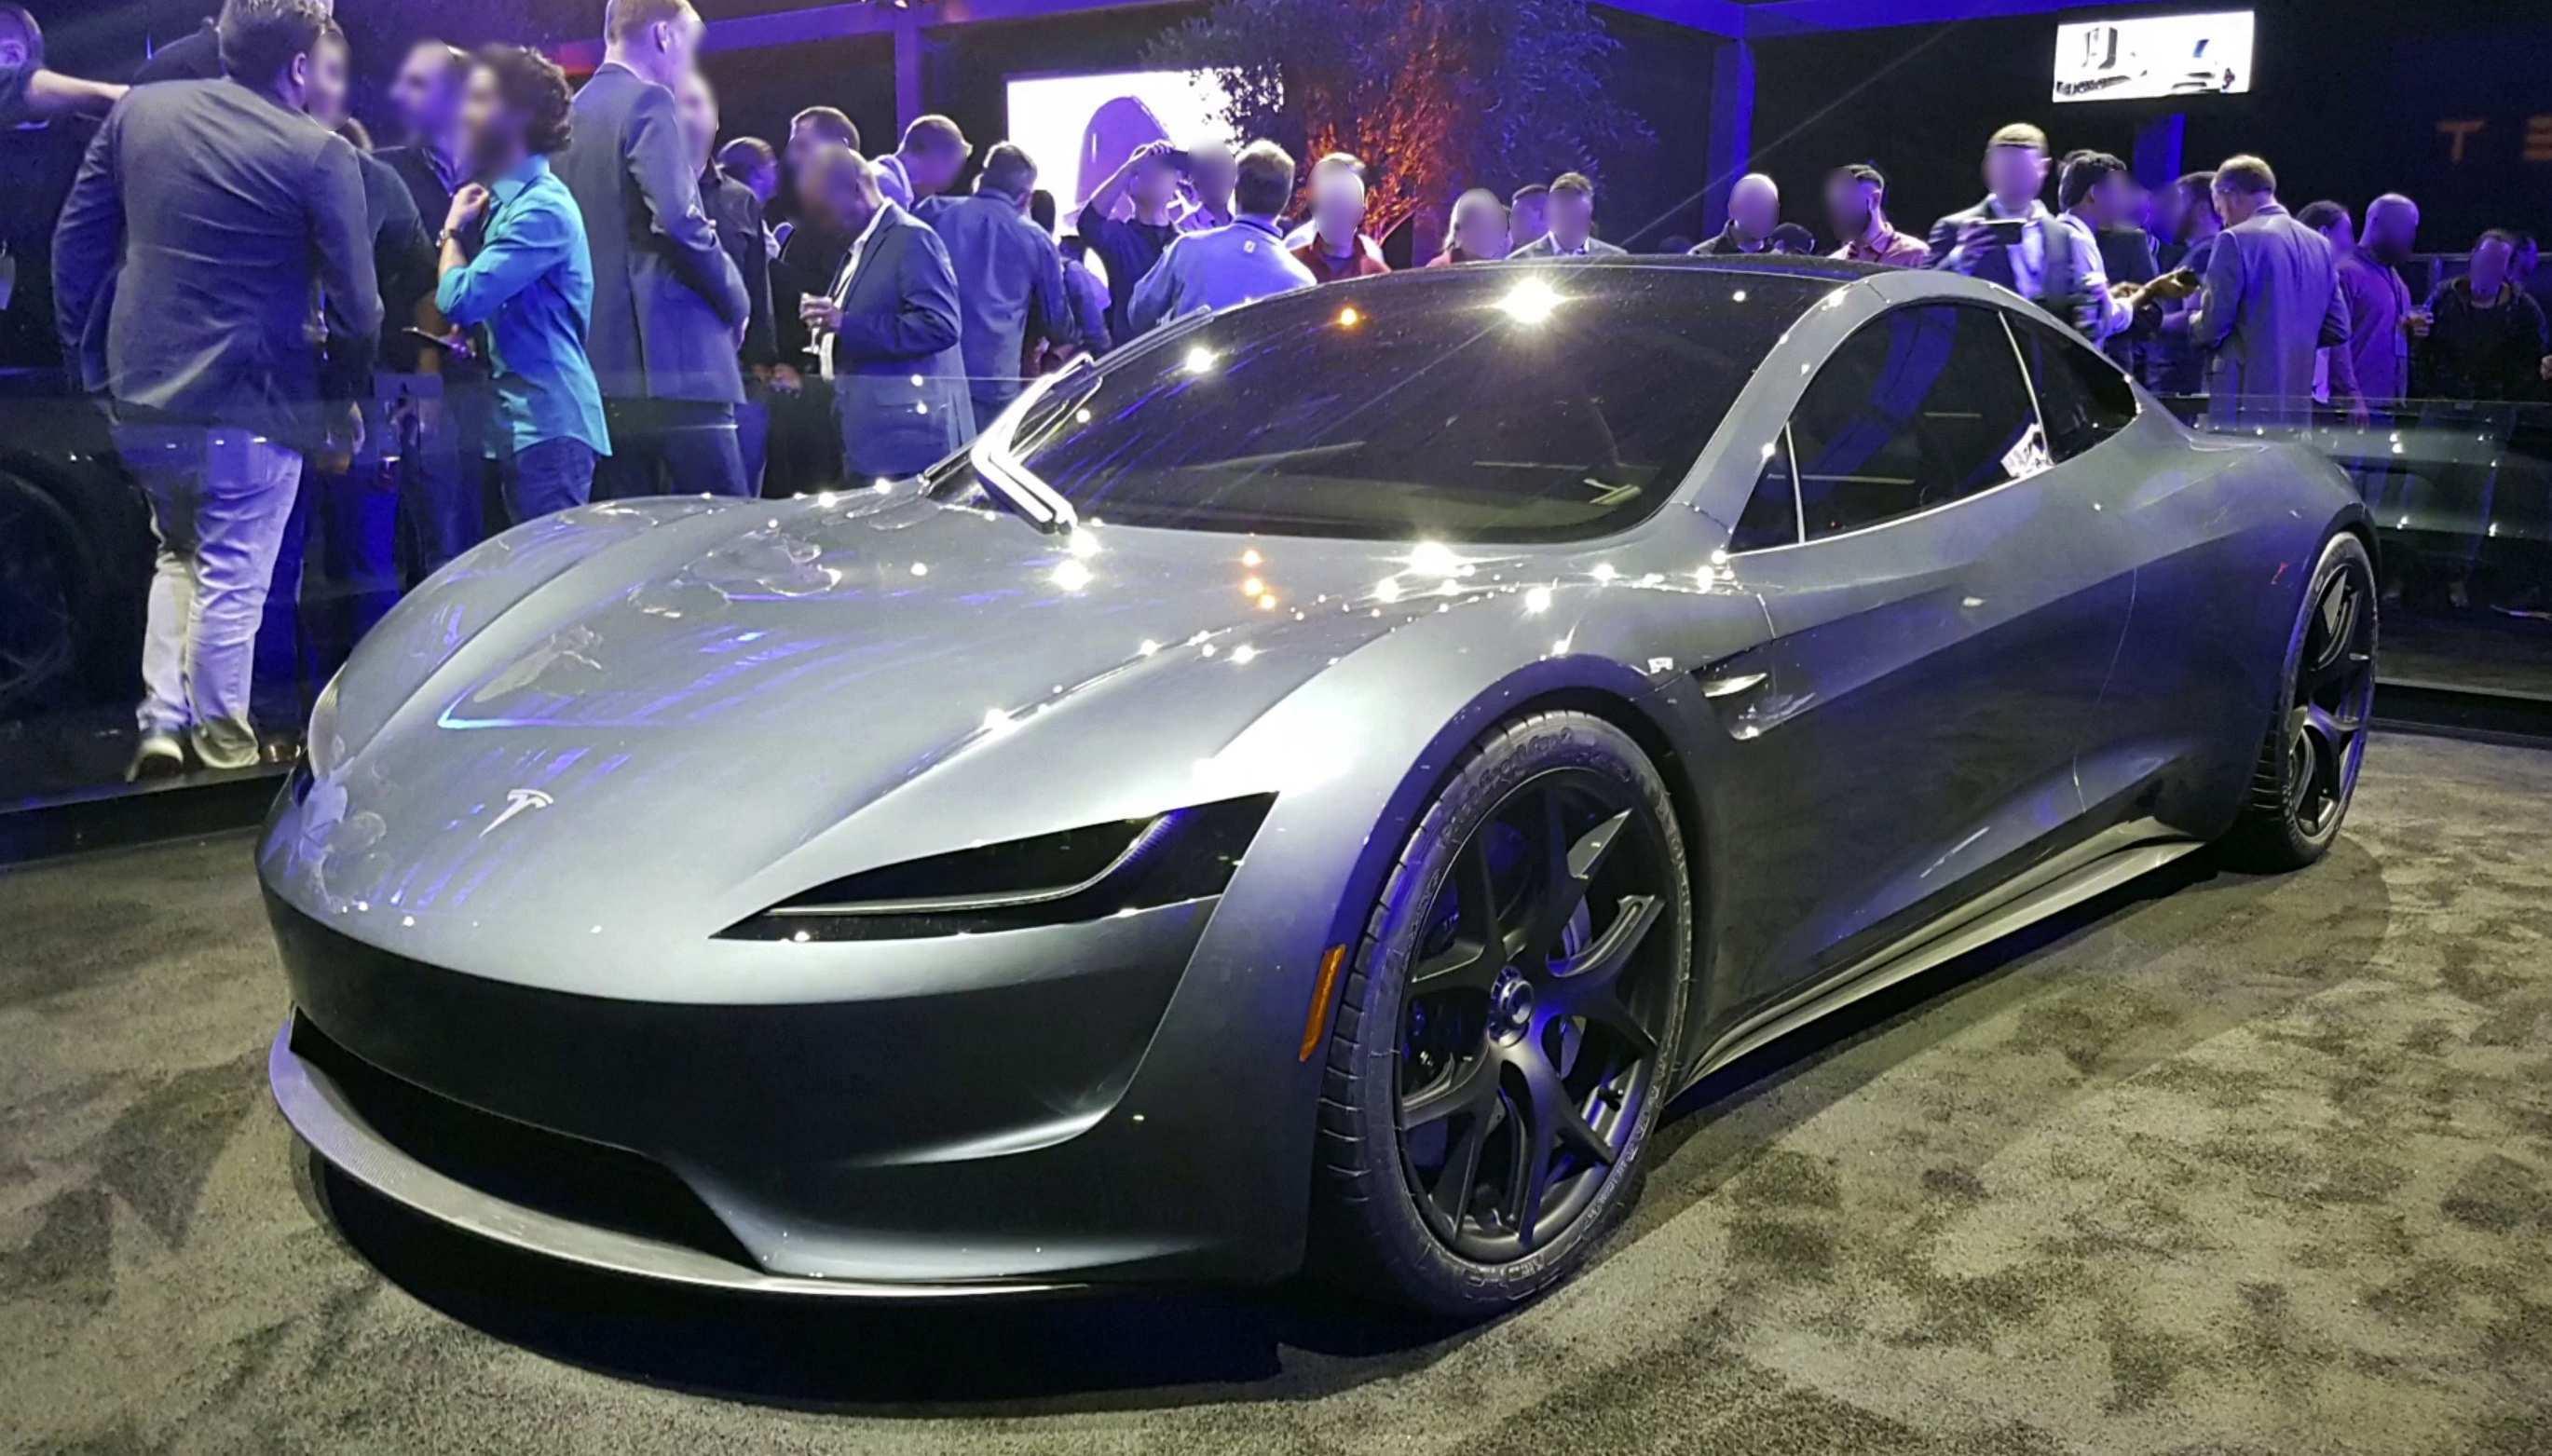 39 All New 2020 Tesla Roadster Battery Overview for 2020 Tesla Roadster Battery